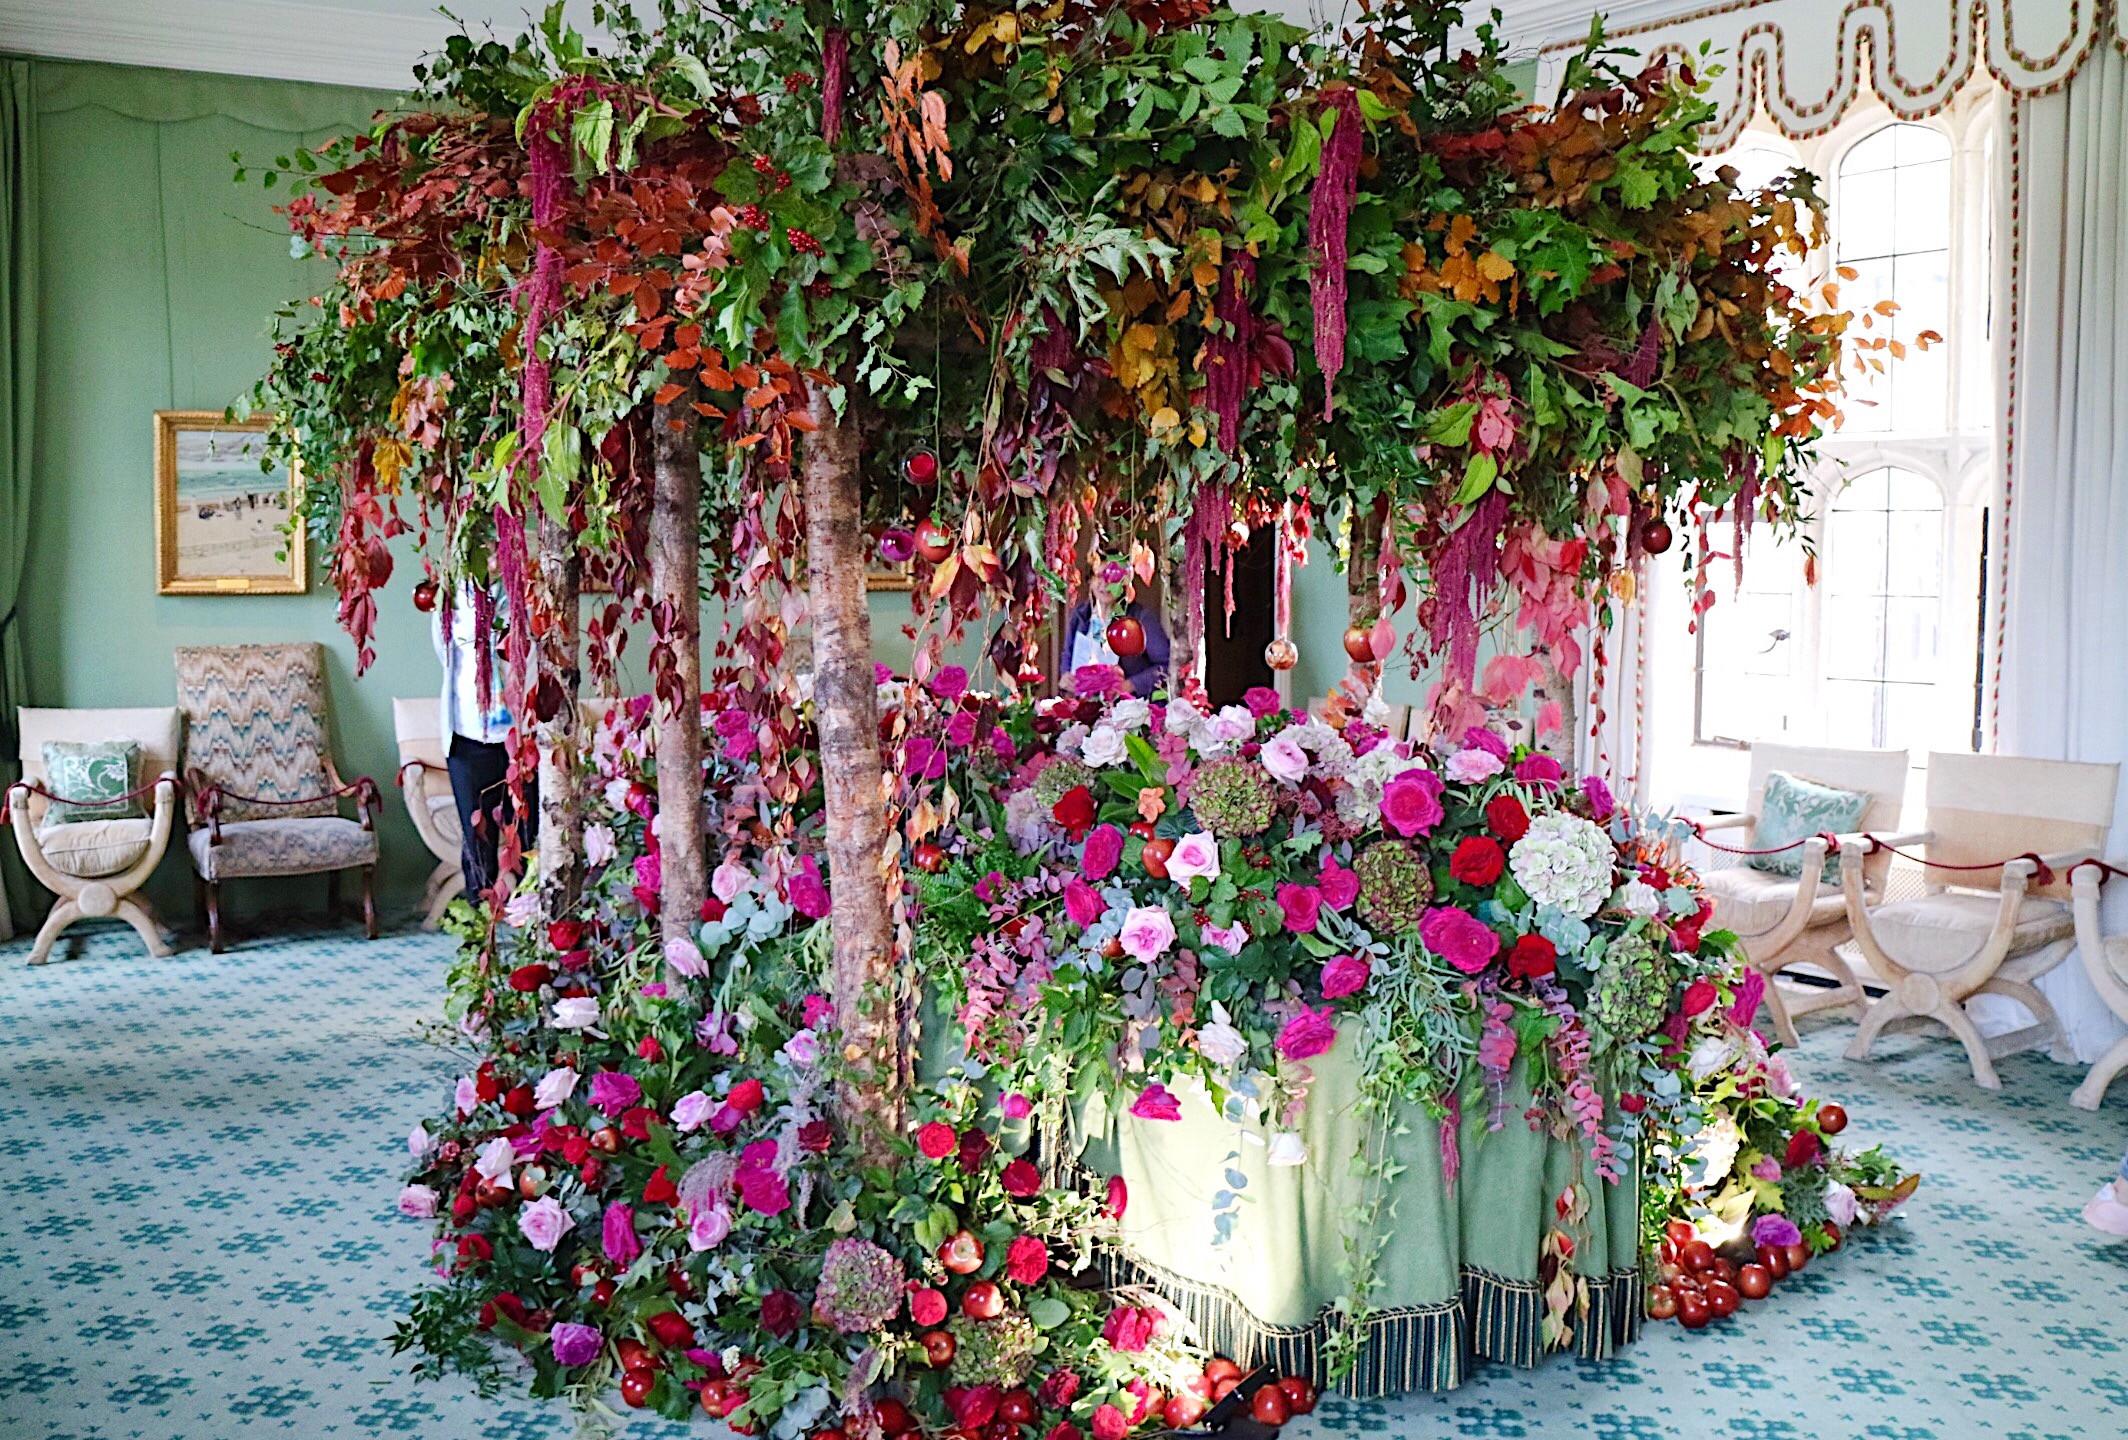 Gothic Snow White themed installation.